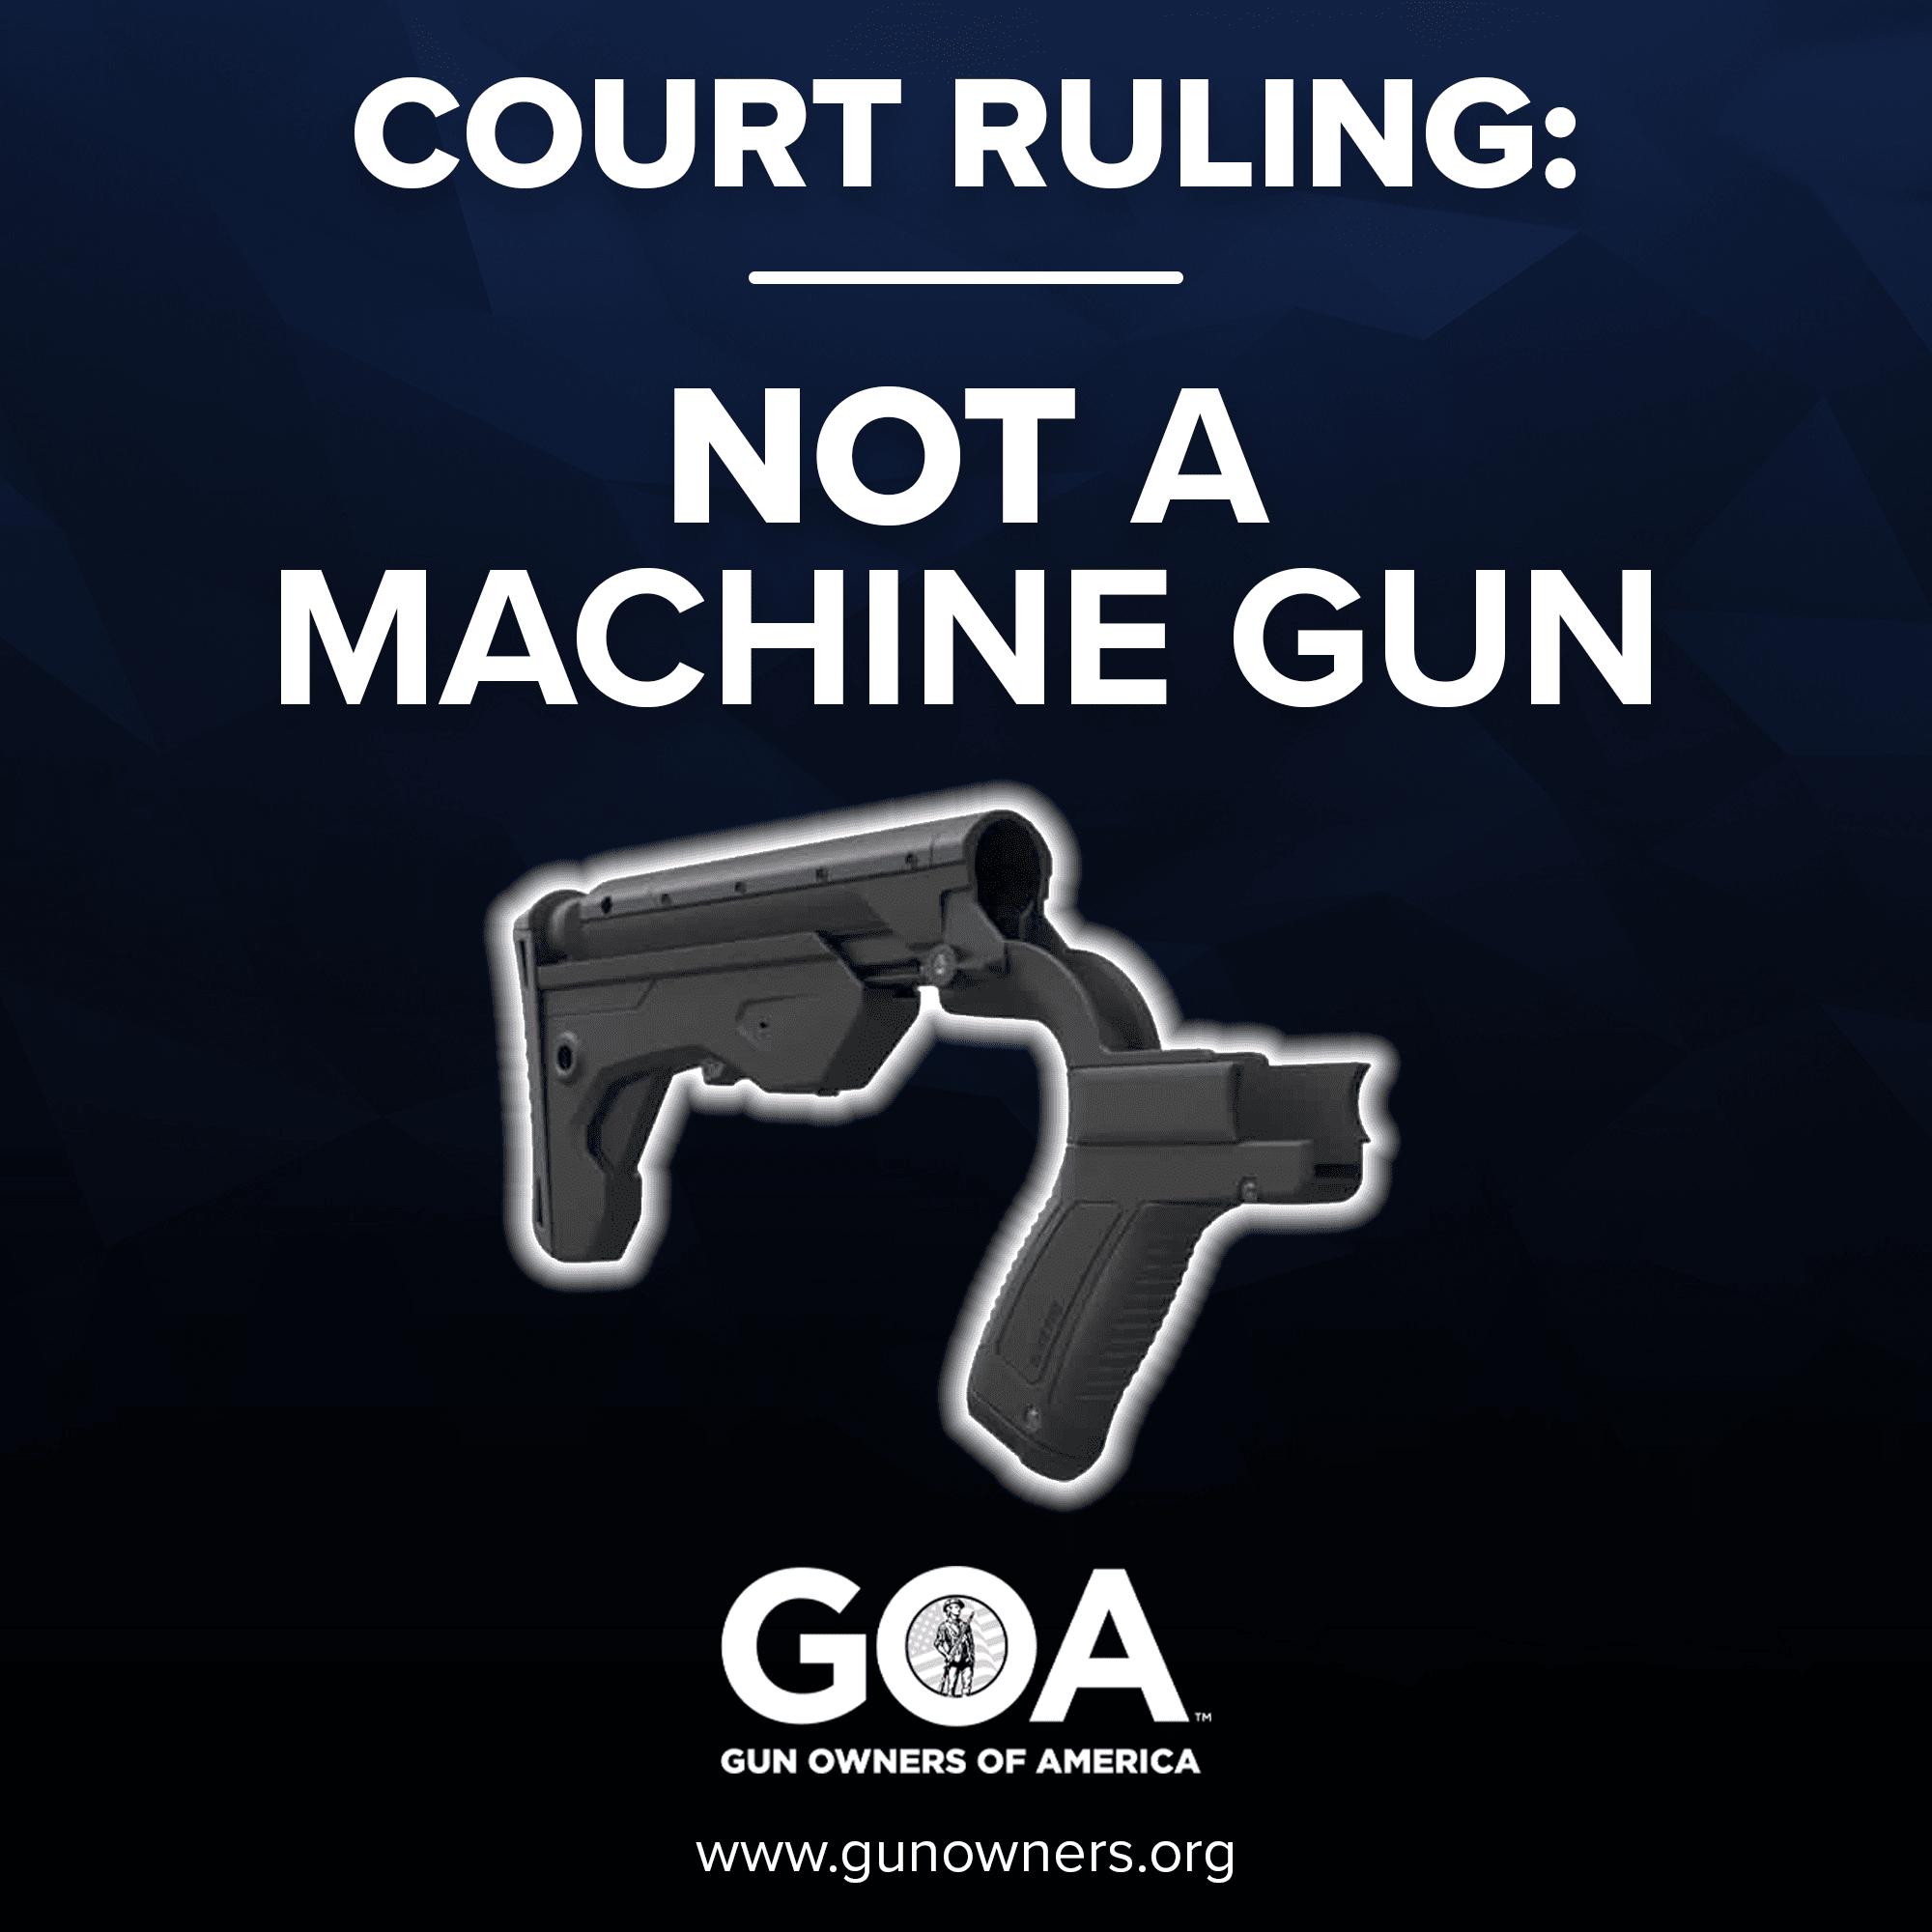 Court ruling: bump stocks are not machine guns